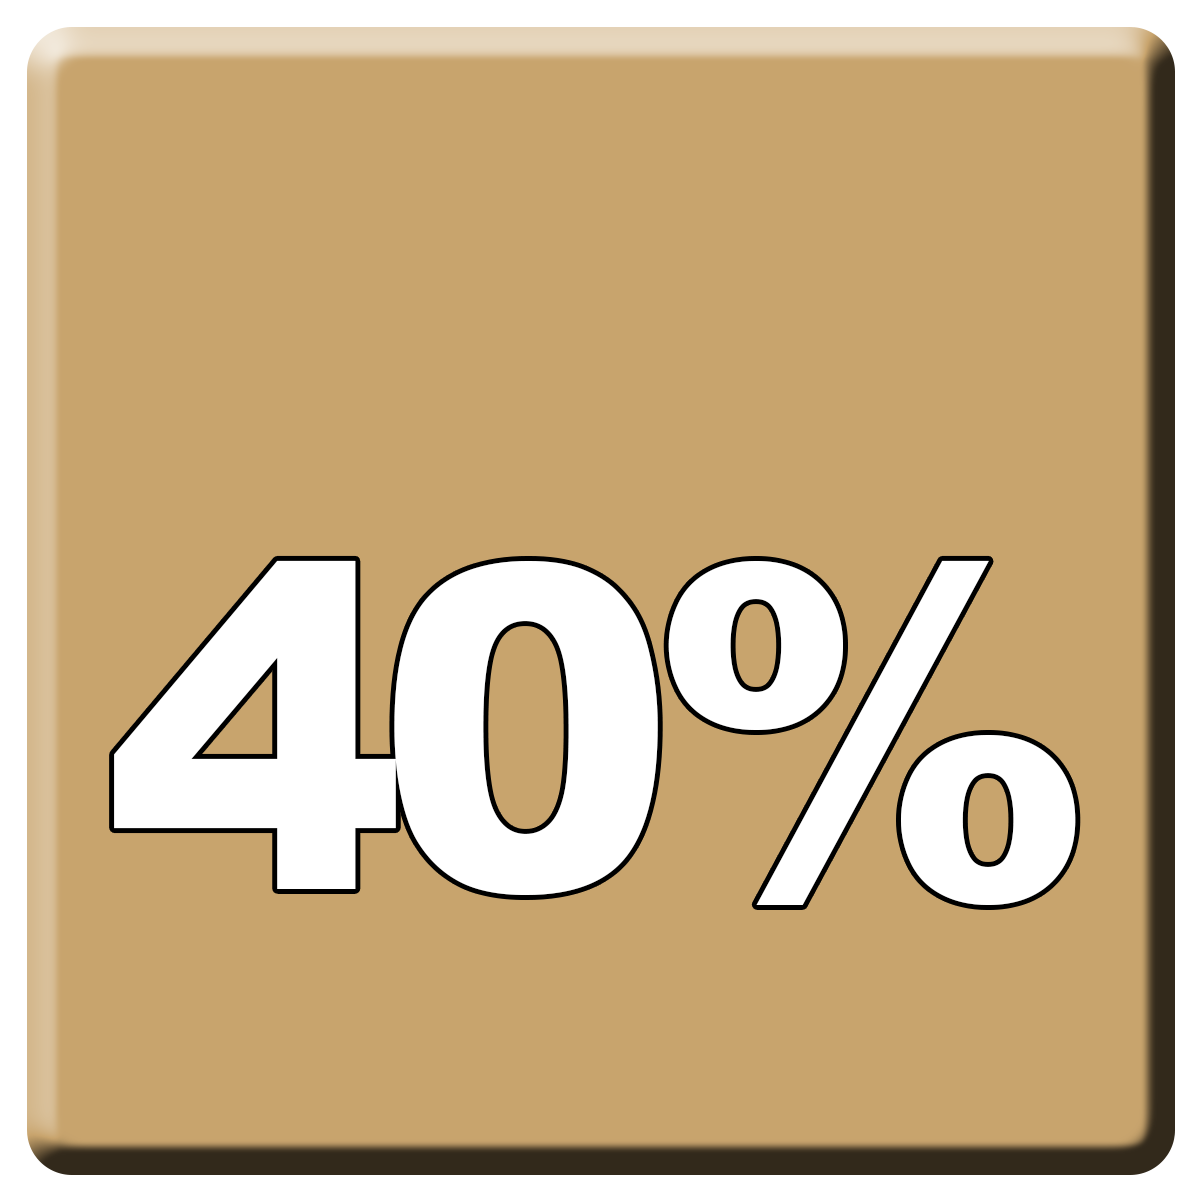 Icono de la imagen de la promocion